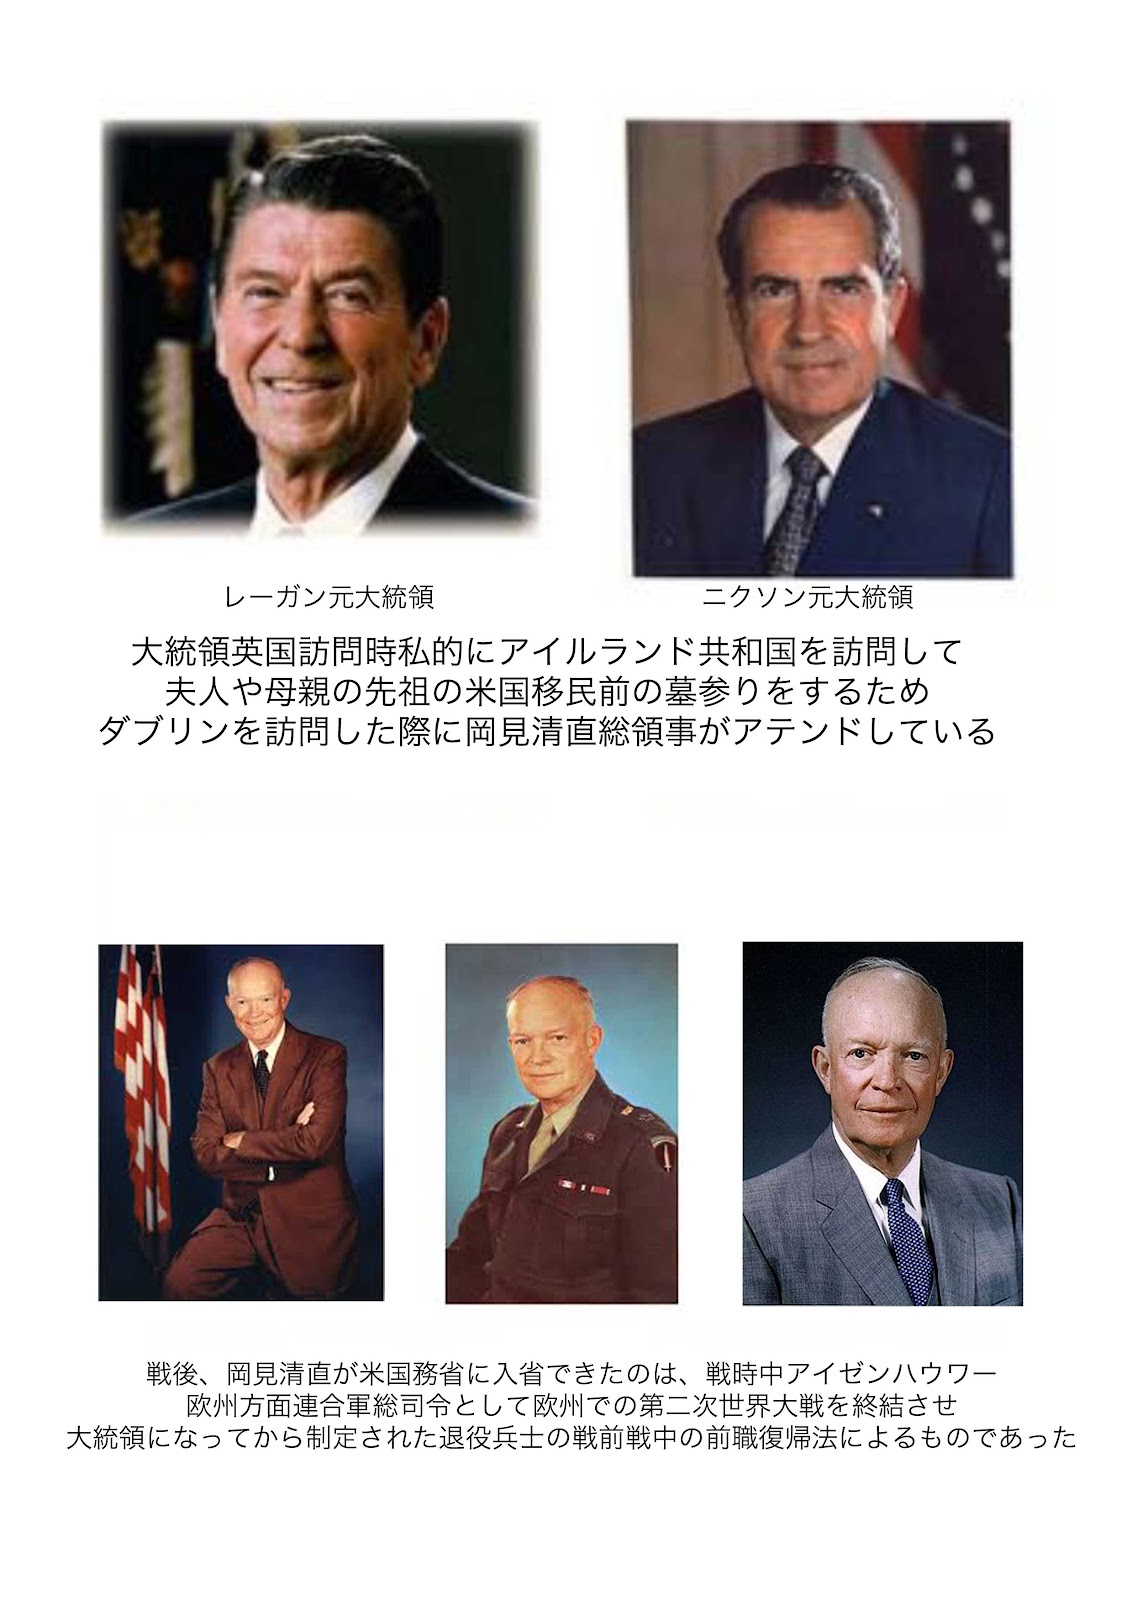 05_photo.jpg